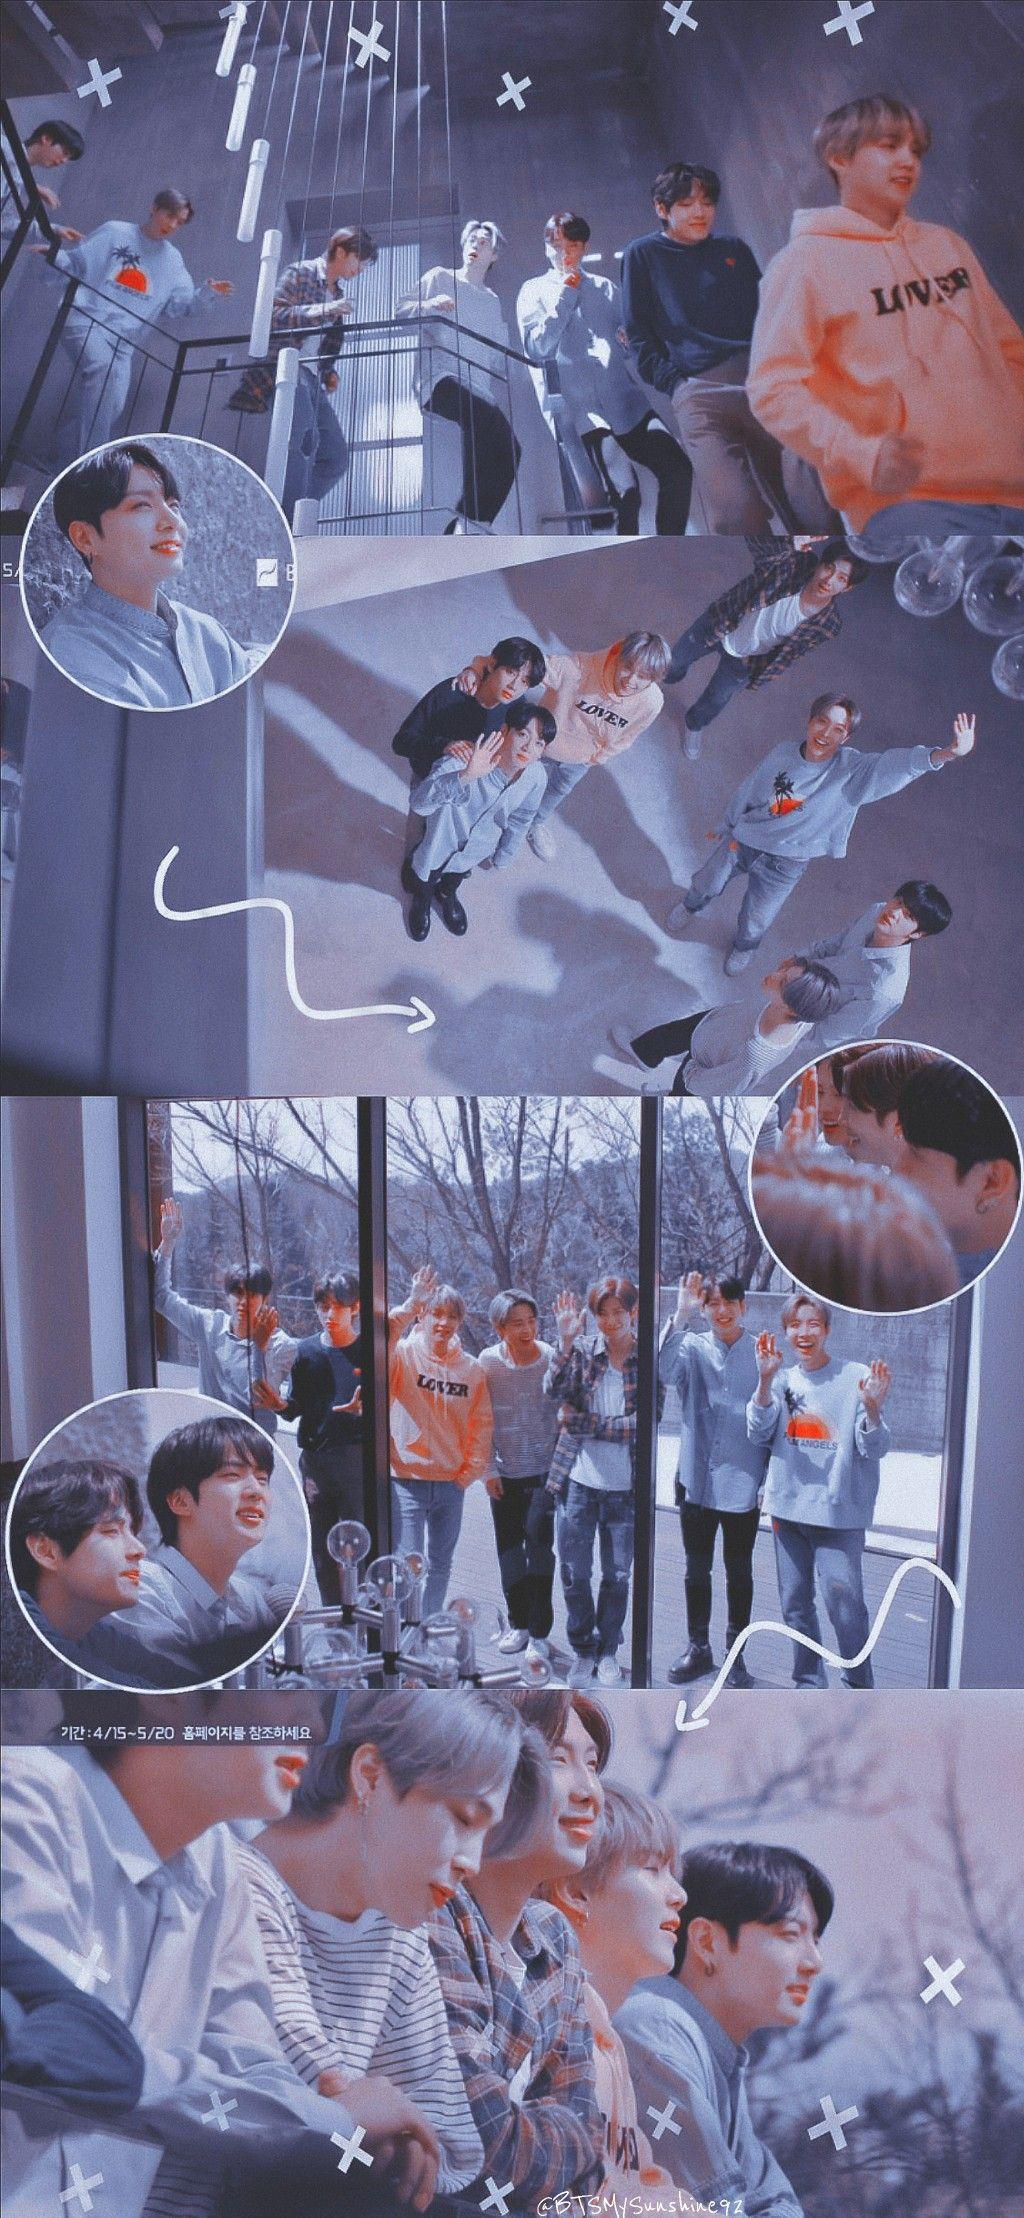 Bts X Bodyfriend House Tvcf Gambar Bts Foto Lucu Gambar Foto wallpaper bts terbaru 2021